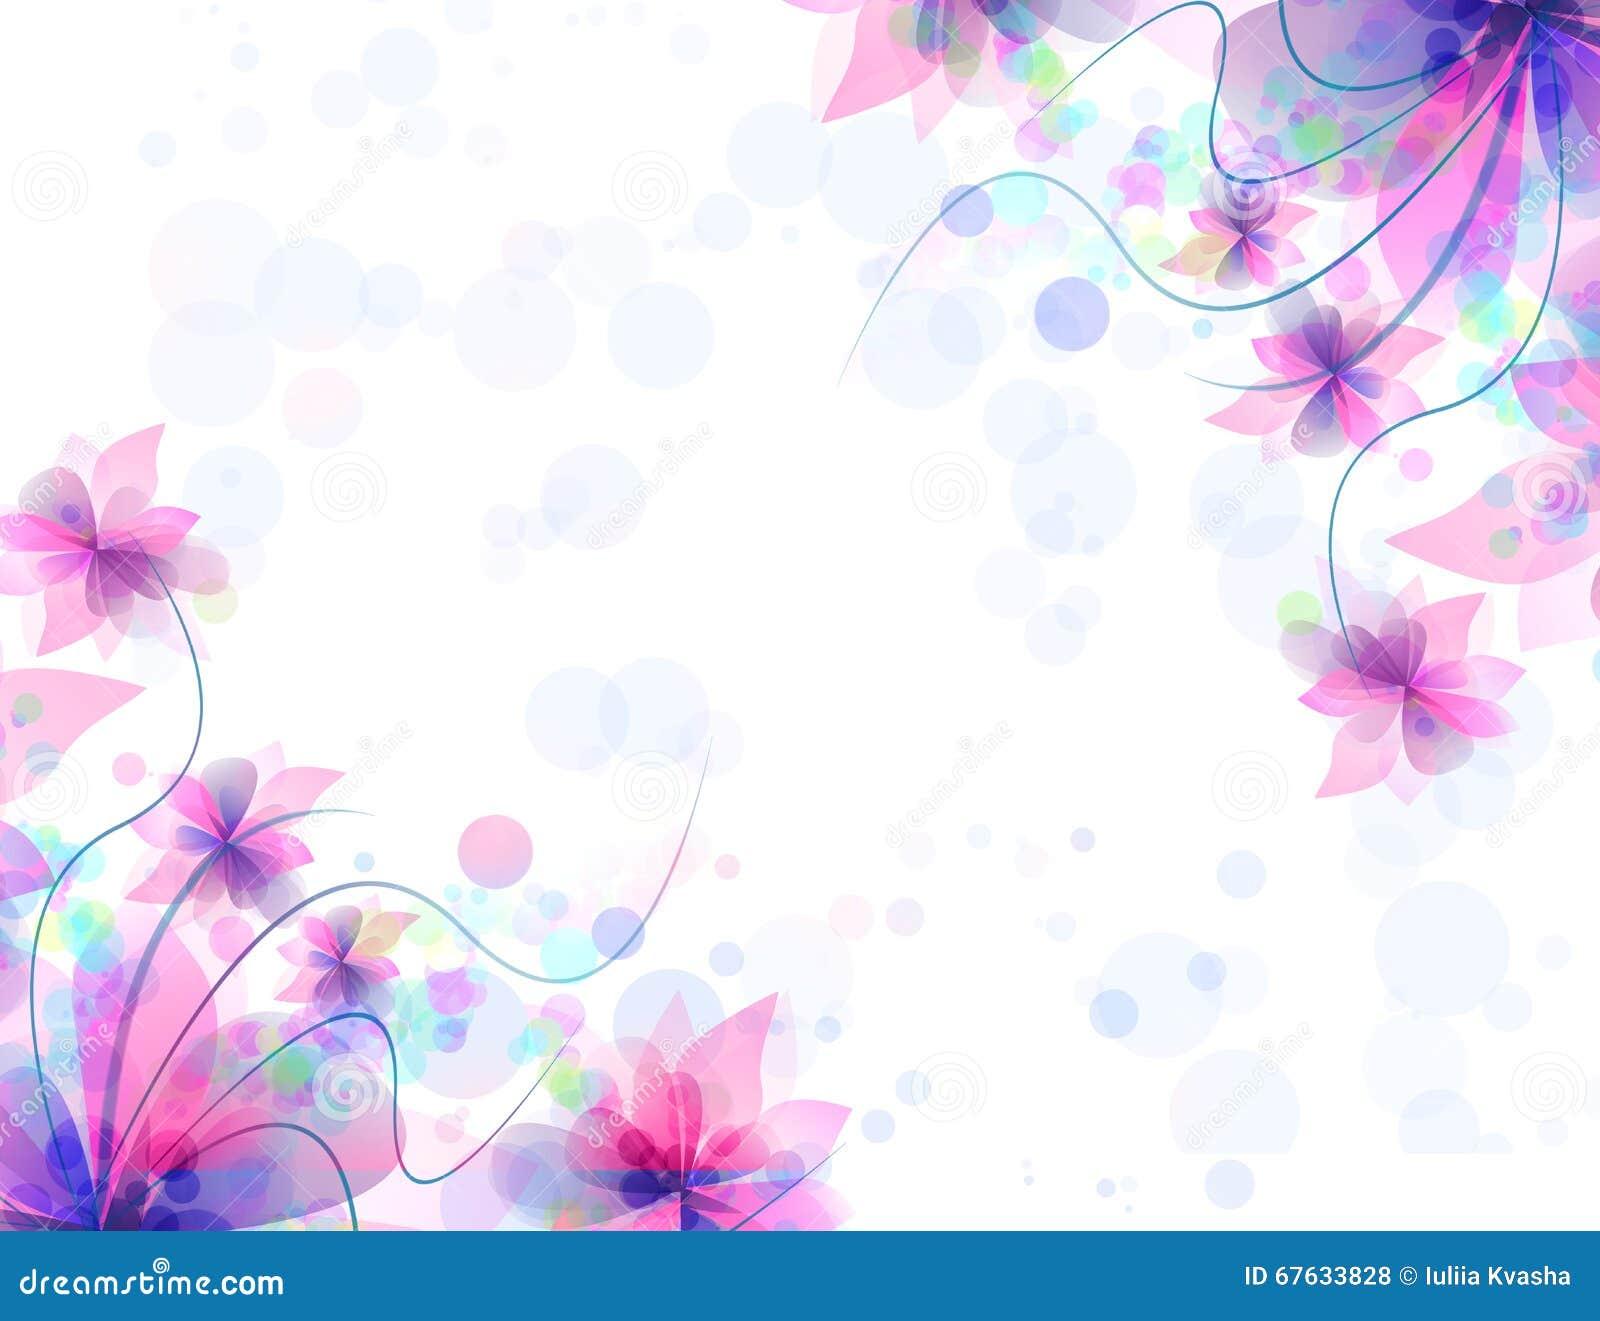 Best romantic flower background stock illustration illustration of download best romantic flower background stock illustration illustration of arrangement pink 67633828 mightylinksfo